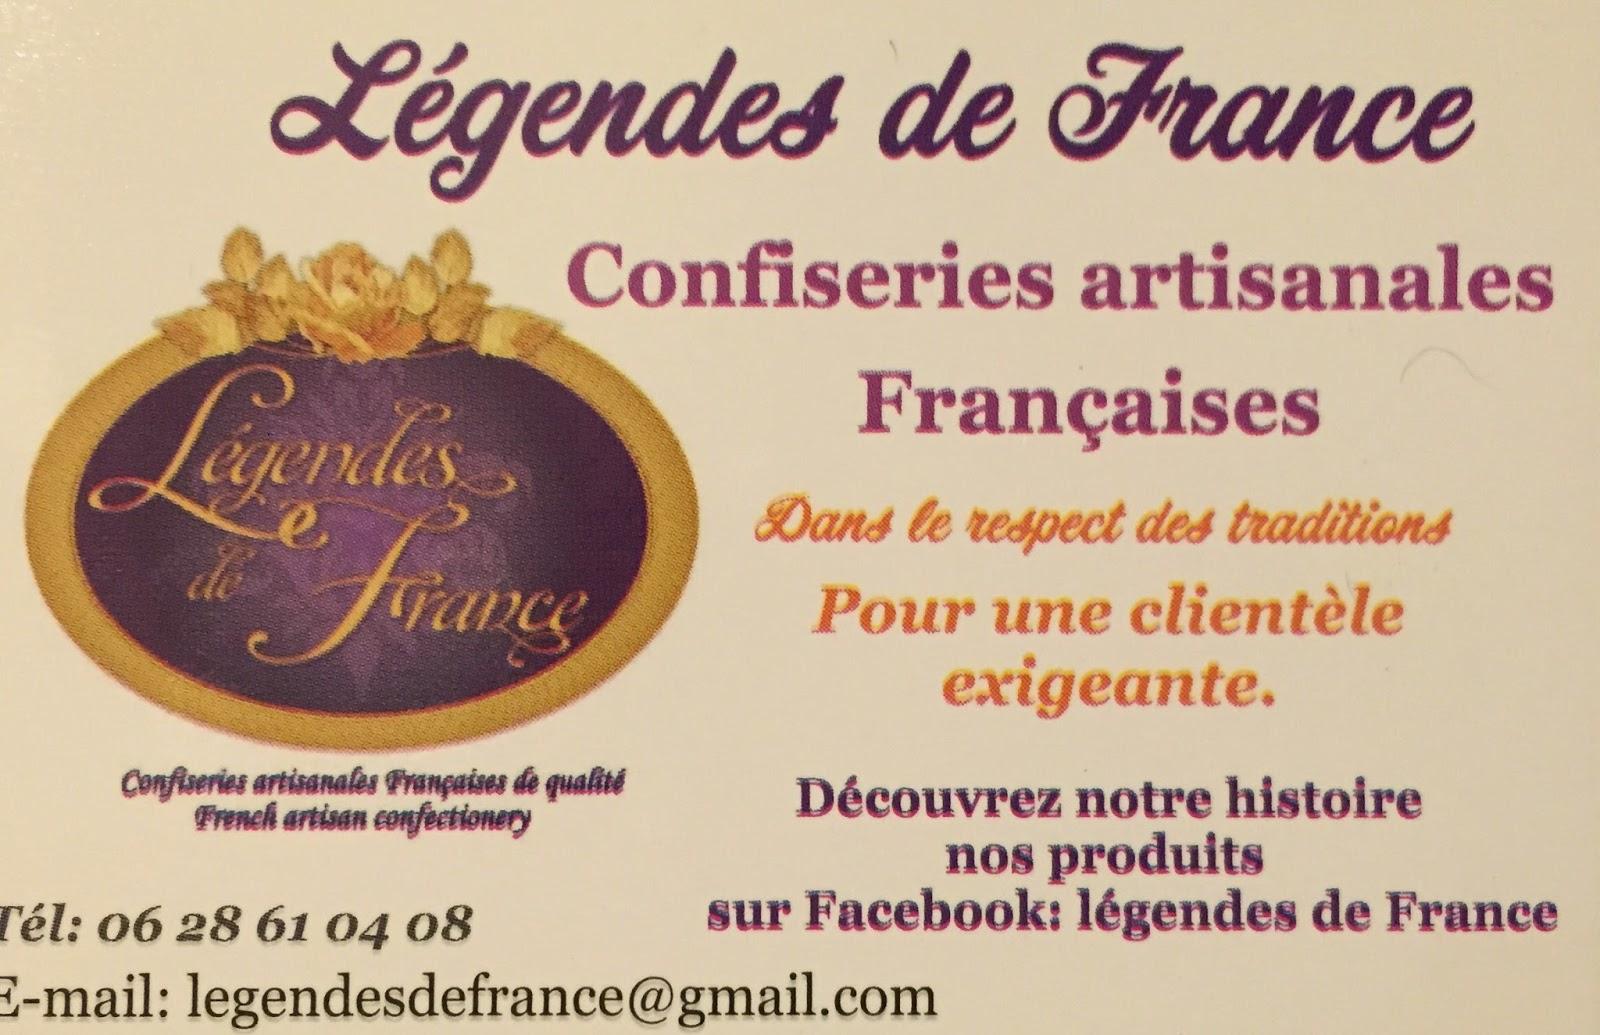 http://danslacuisinedecharlottine.blogspot.fr/2015/03/legendes-de-france-confiseries.html